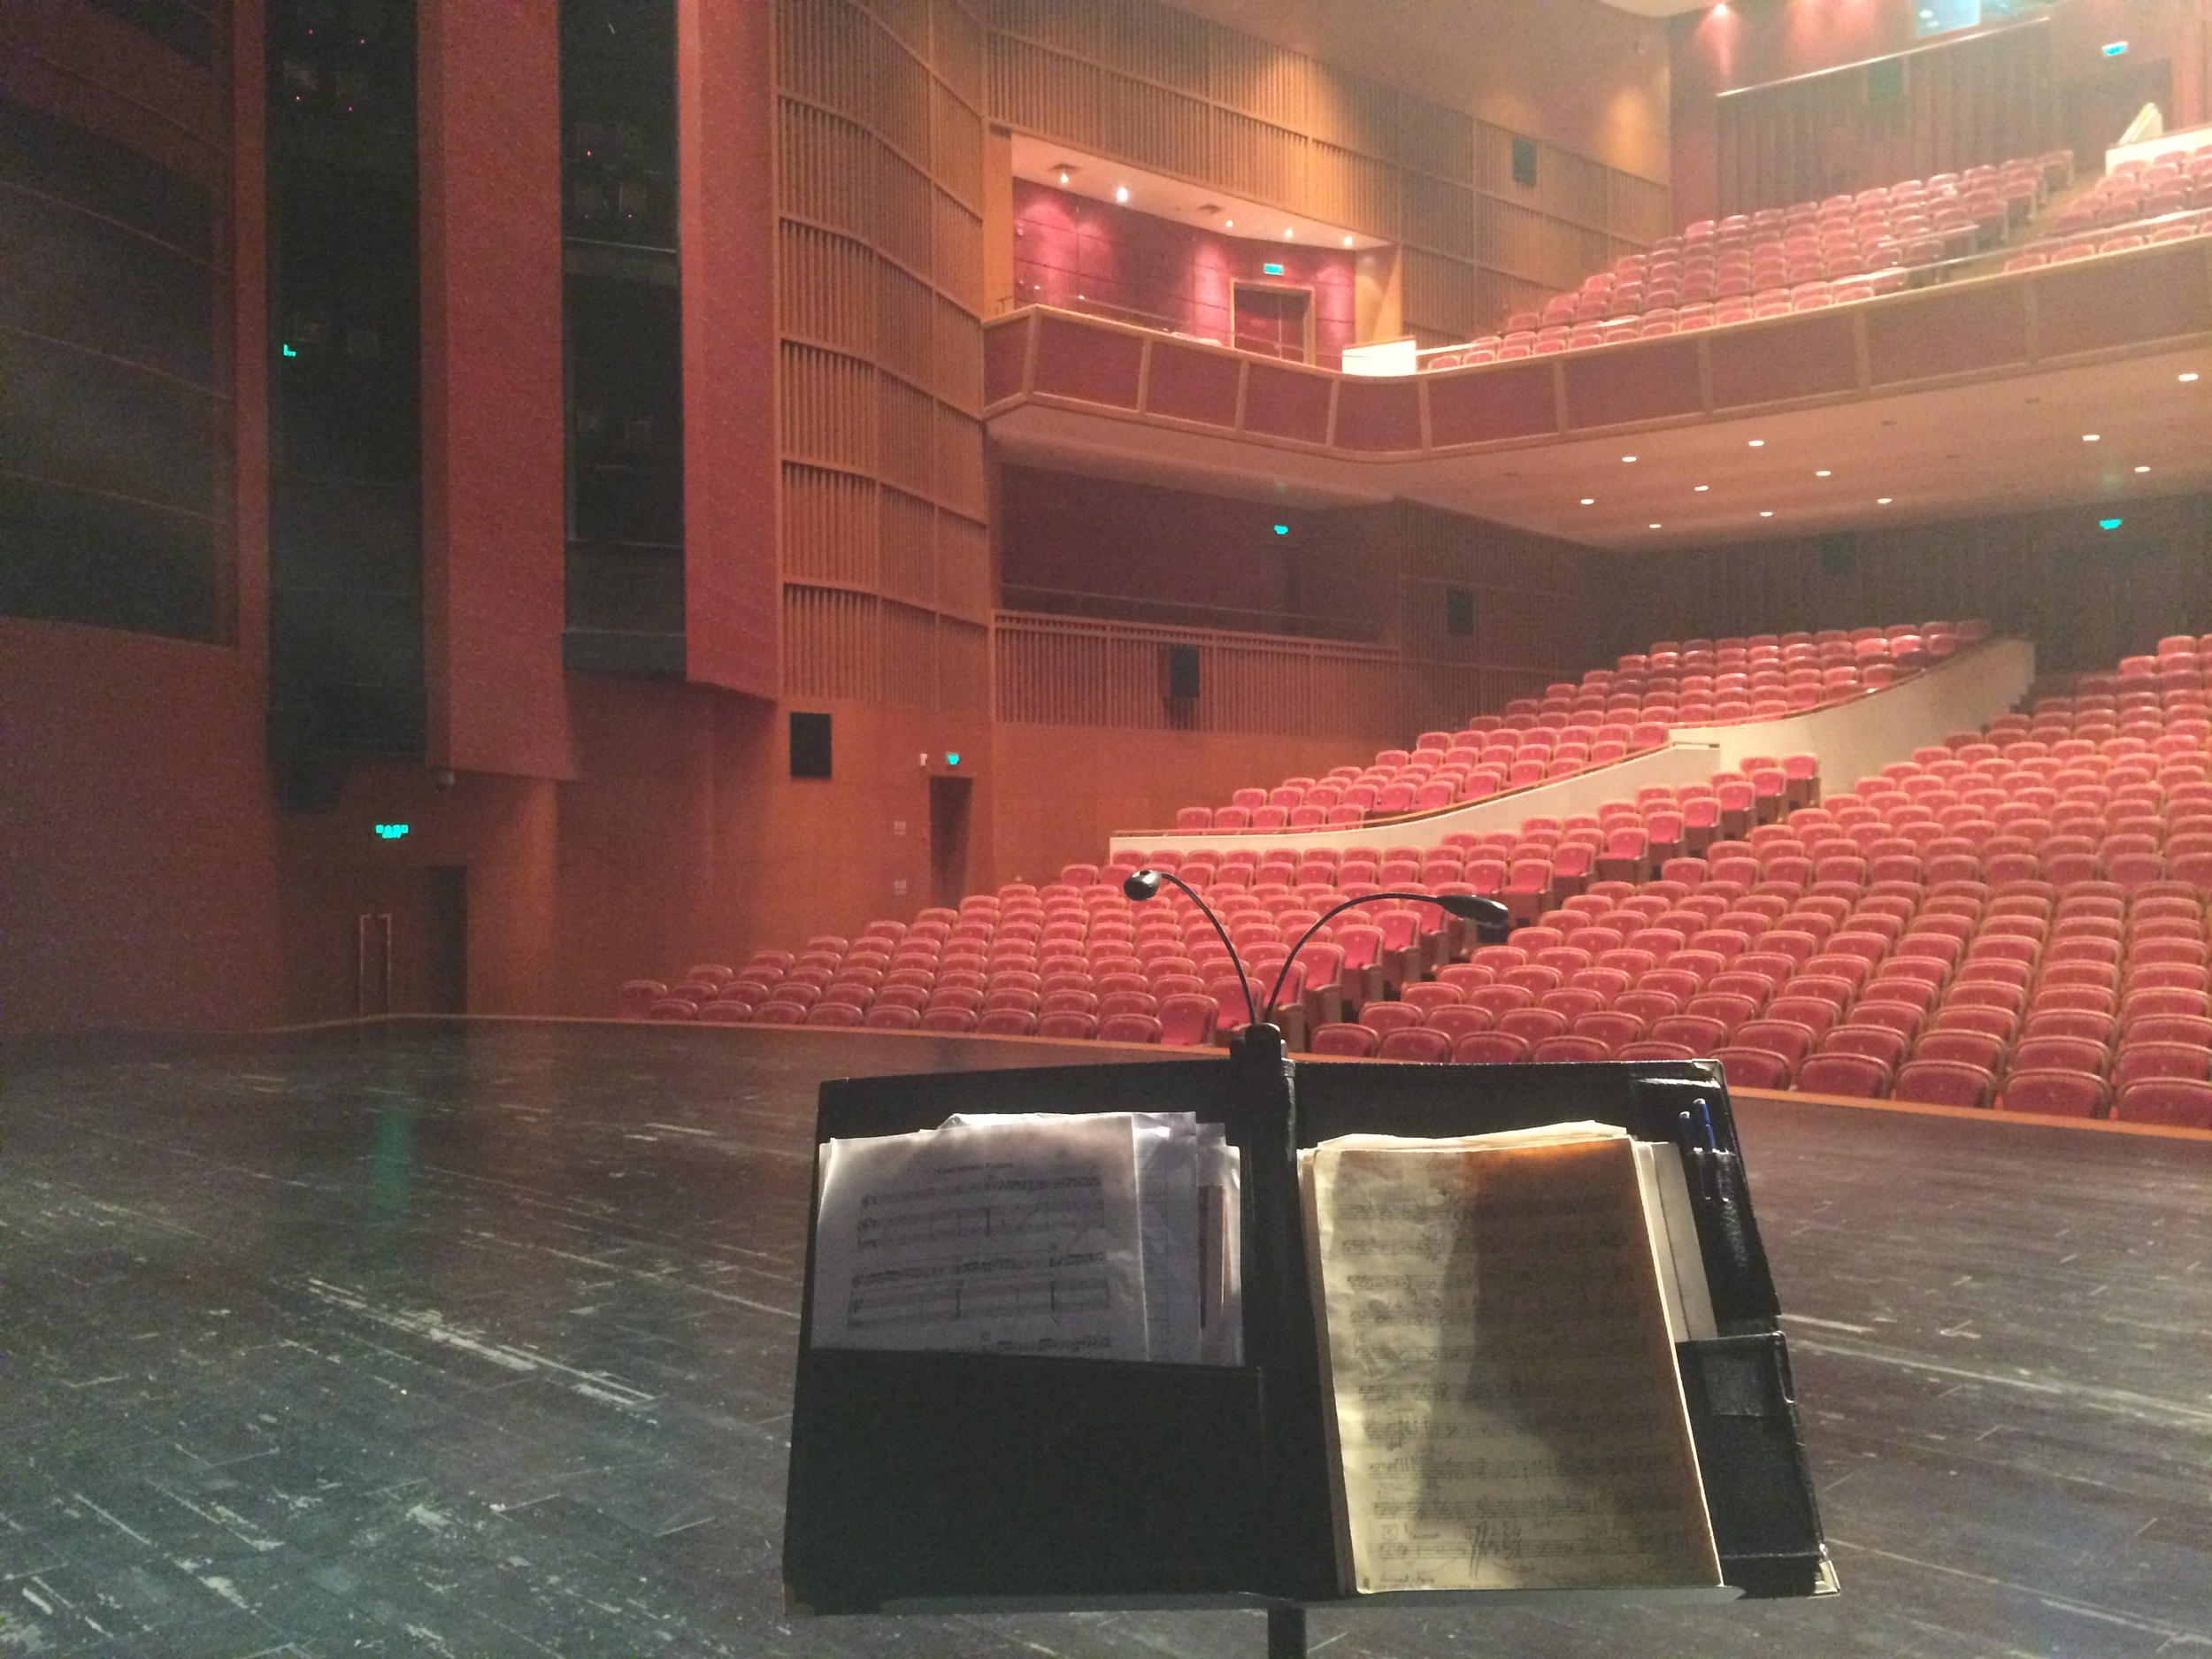 Bass players view. Huizhou Culture & Arts Center Huizhou, China. October 2014